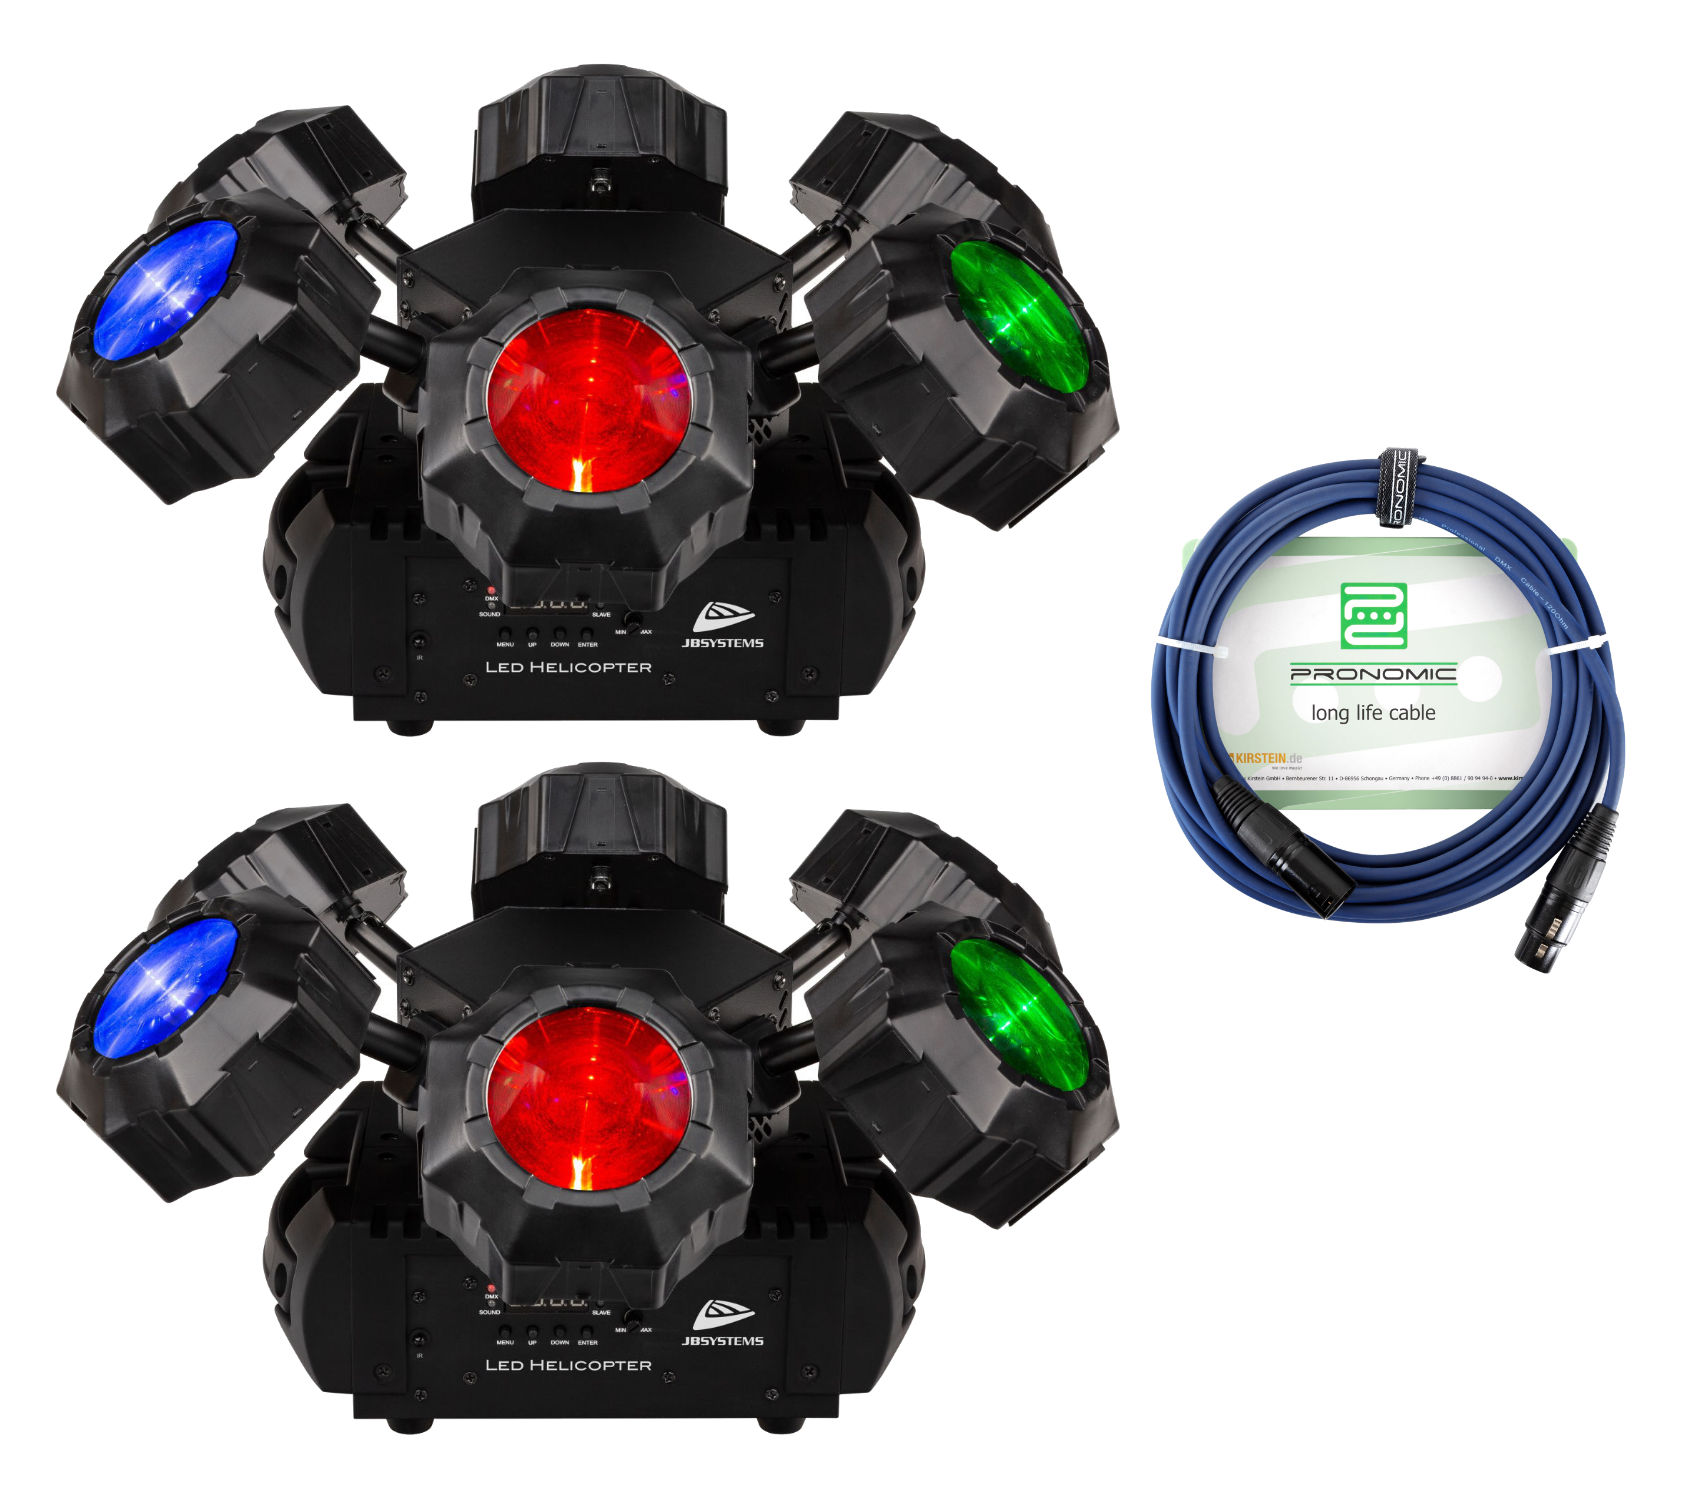 Lichteffekte - JB Systems LED Helicopter Set - Onlineshop Musikhaus Kirstein